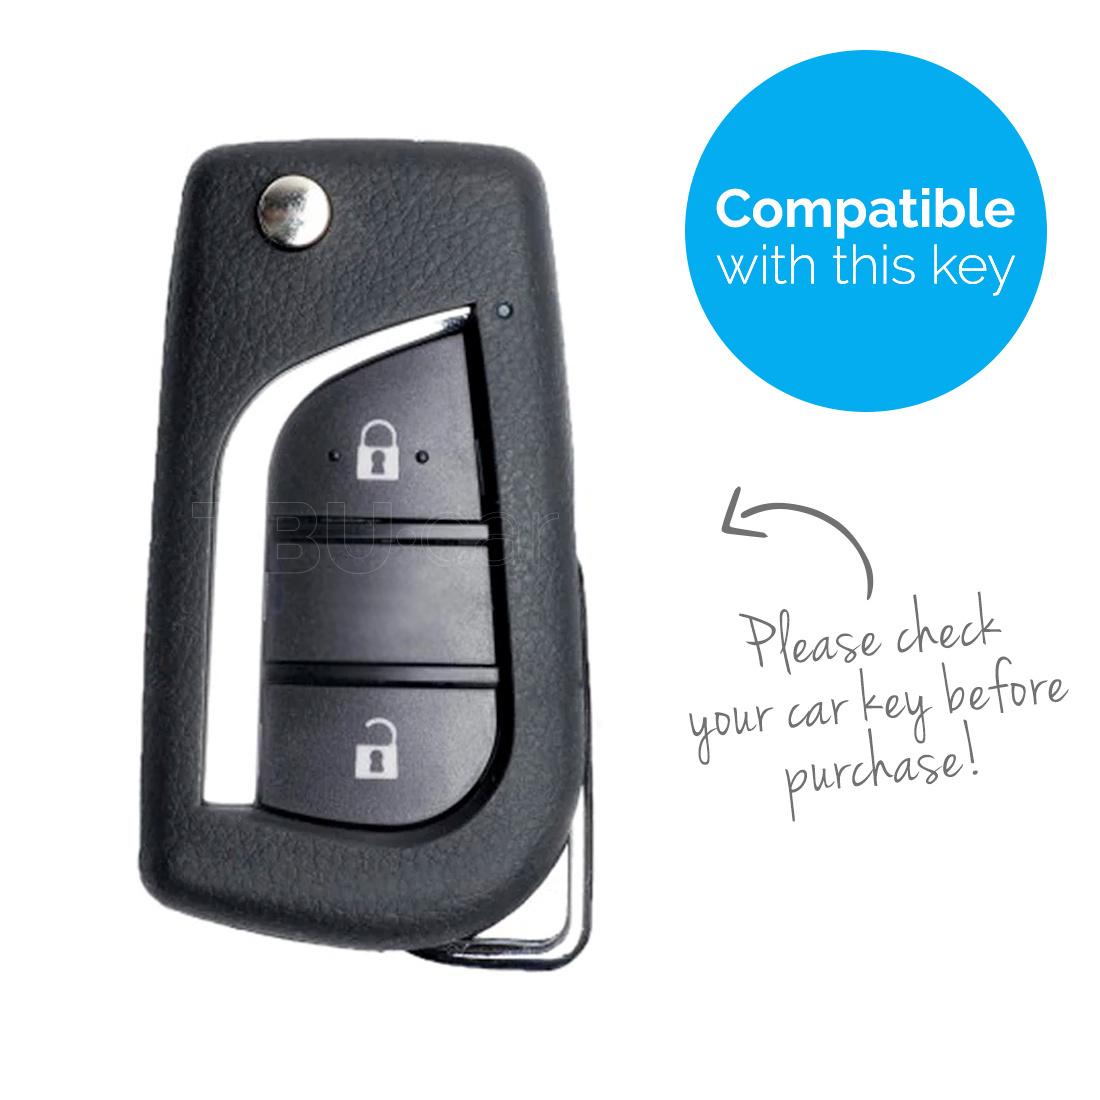 TBU car TBU car Car key cover compatible with Citroën - Silicone Protective Remote Key Shell - FOB Case Cover - Black